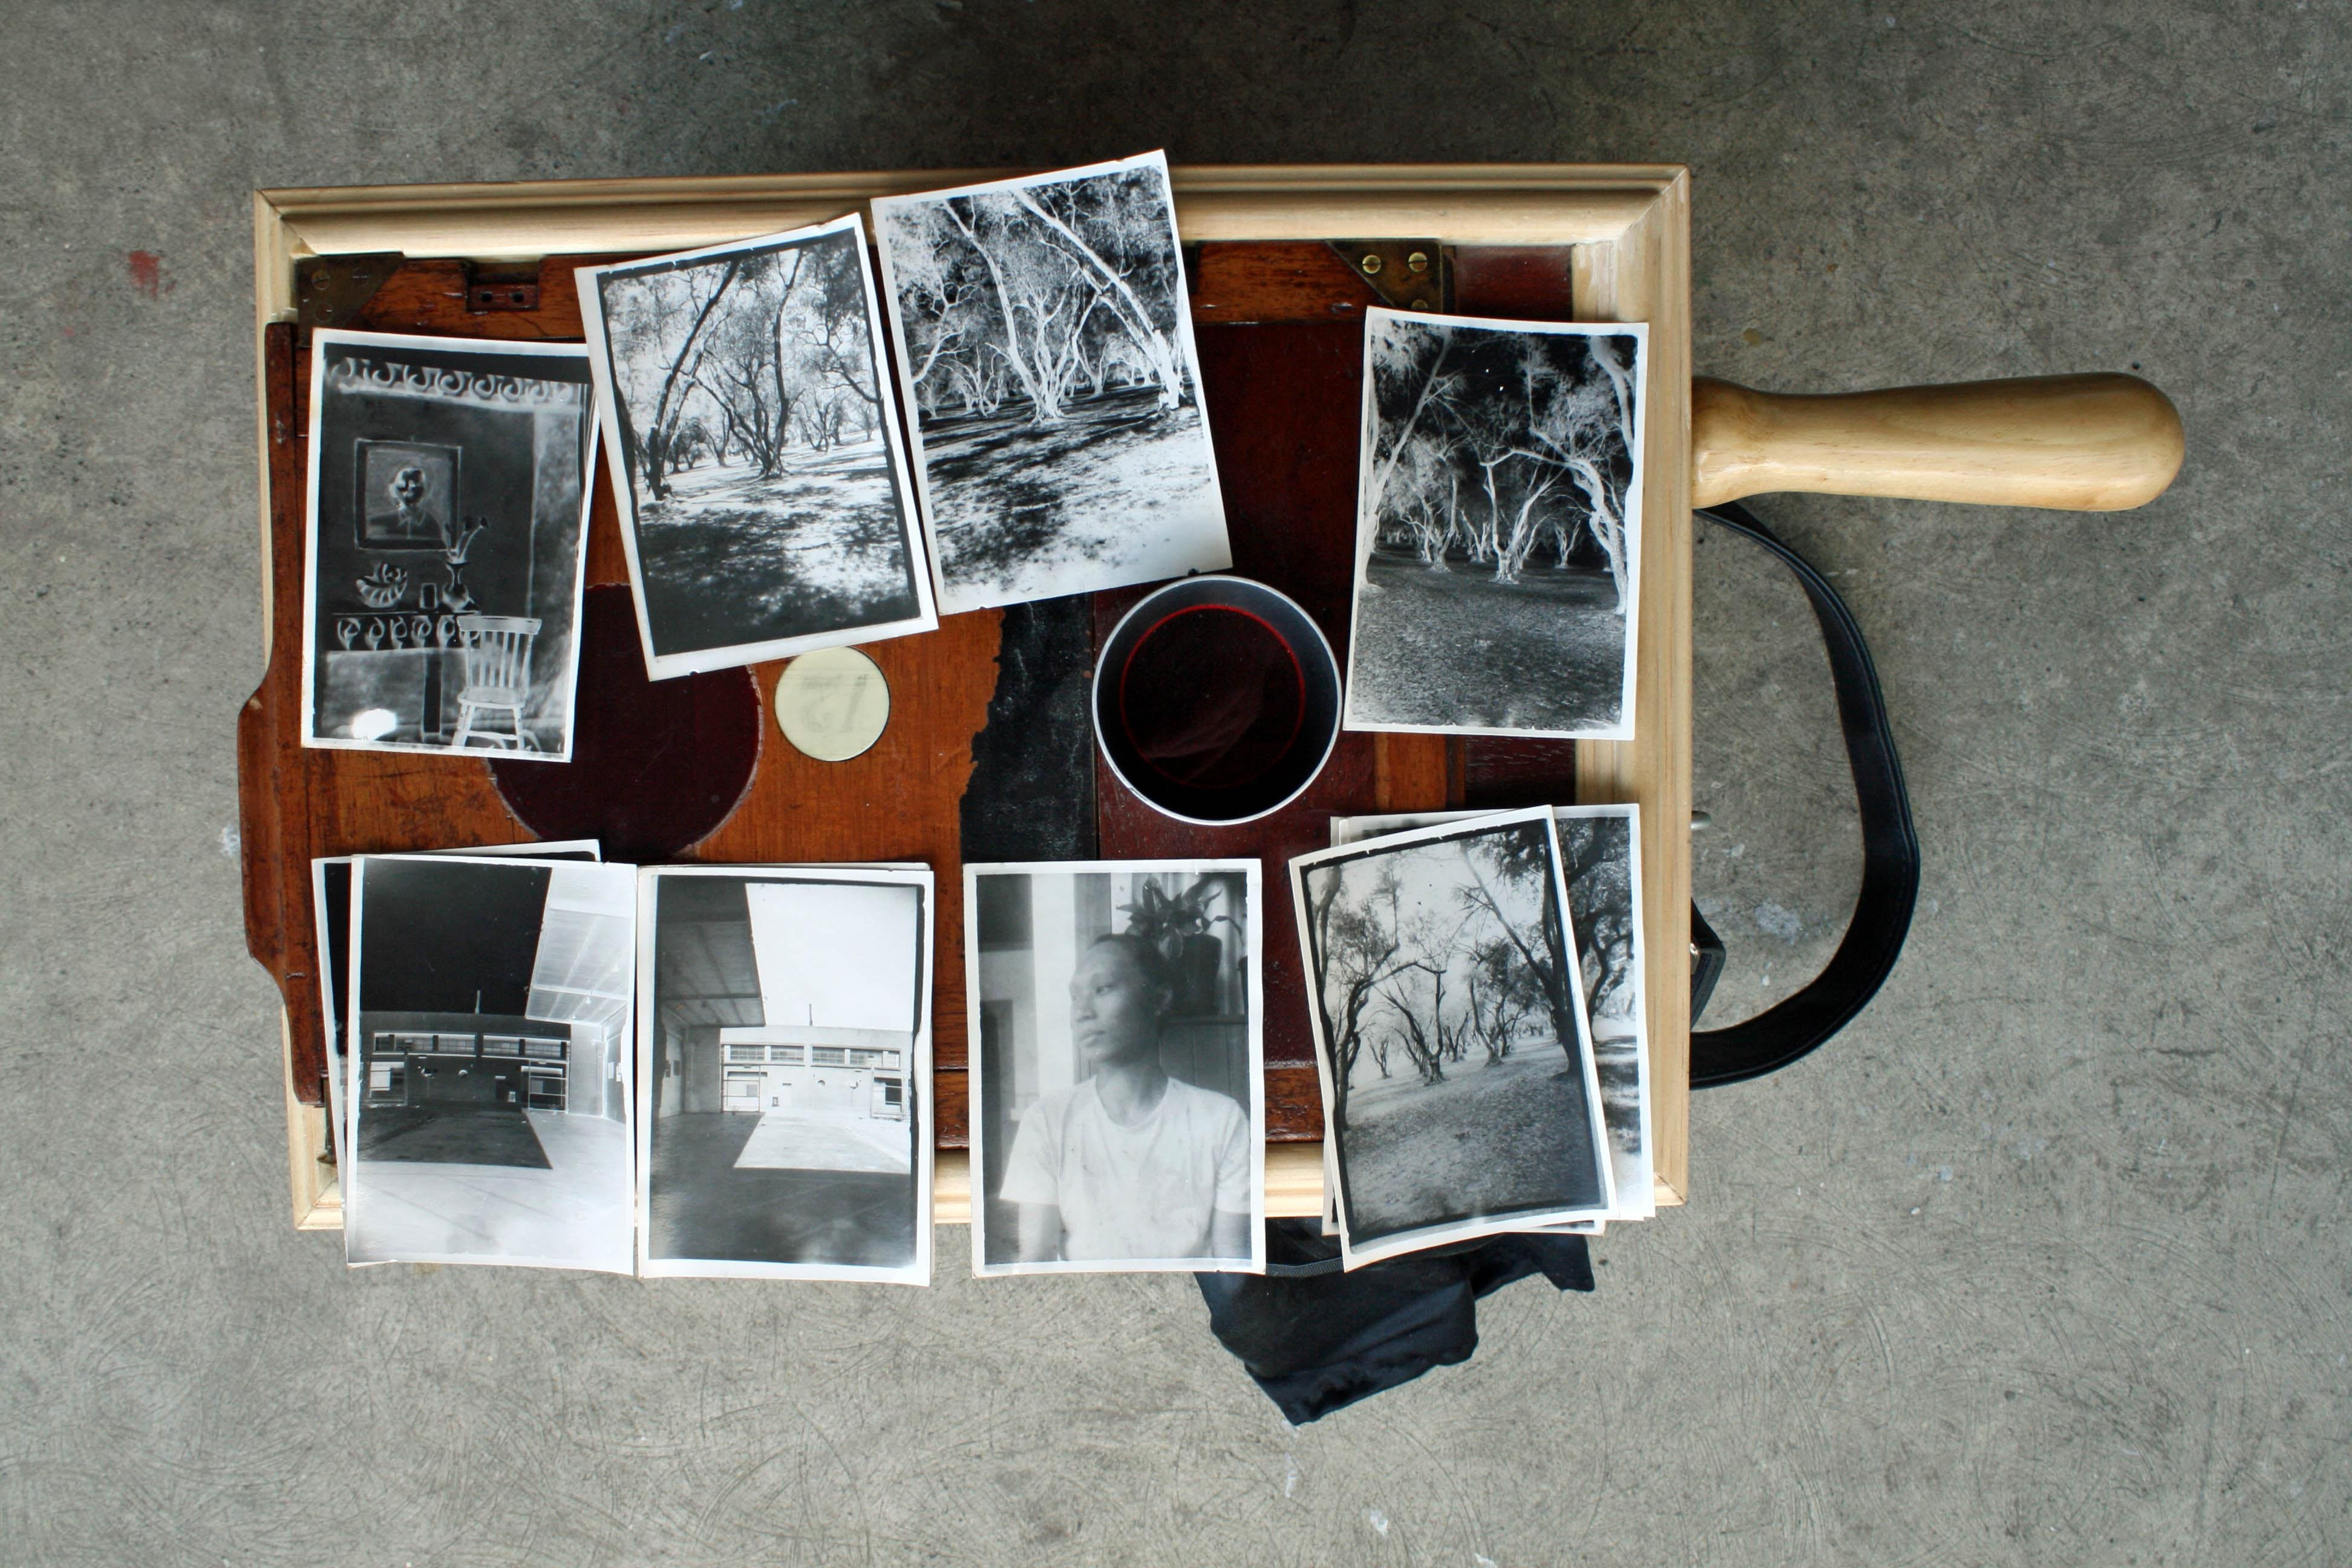 Andrew Dearman SALA 2018 Masterclass  How to make an Afghan Box Camera